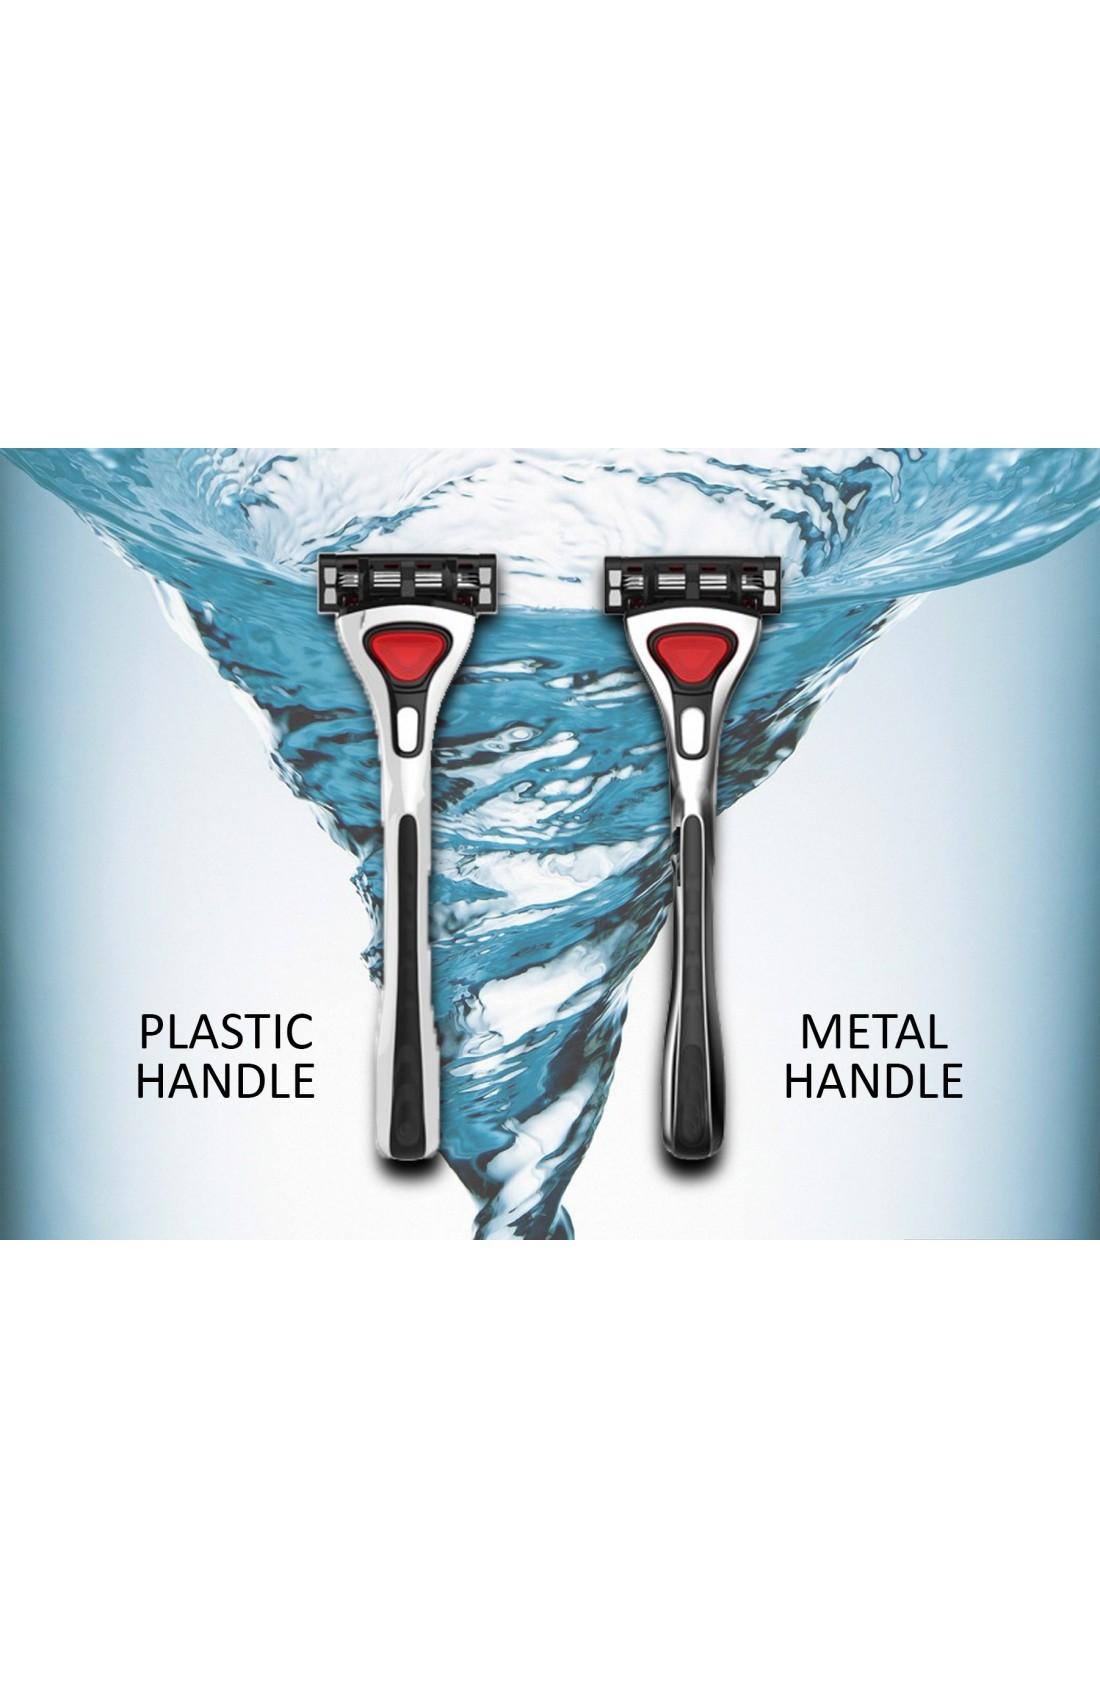 Schick Hydro Compatible Razors Plastic Handle Set